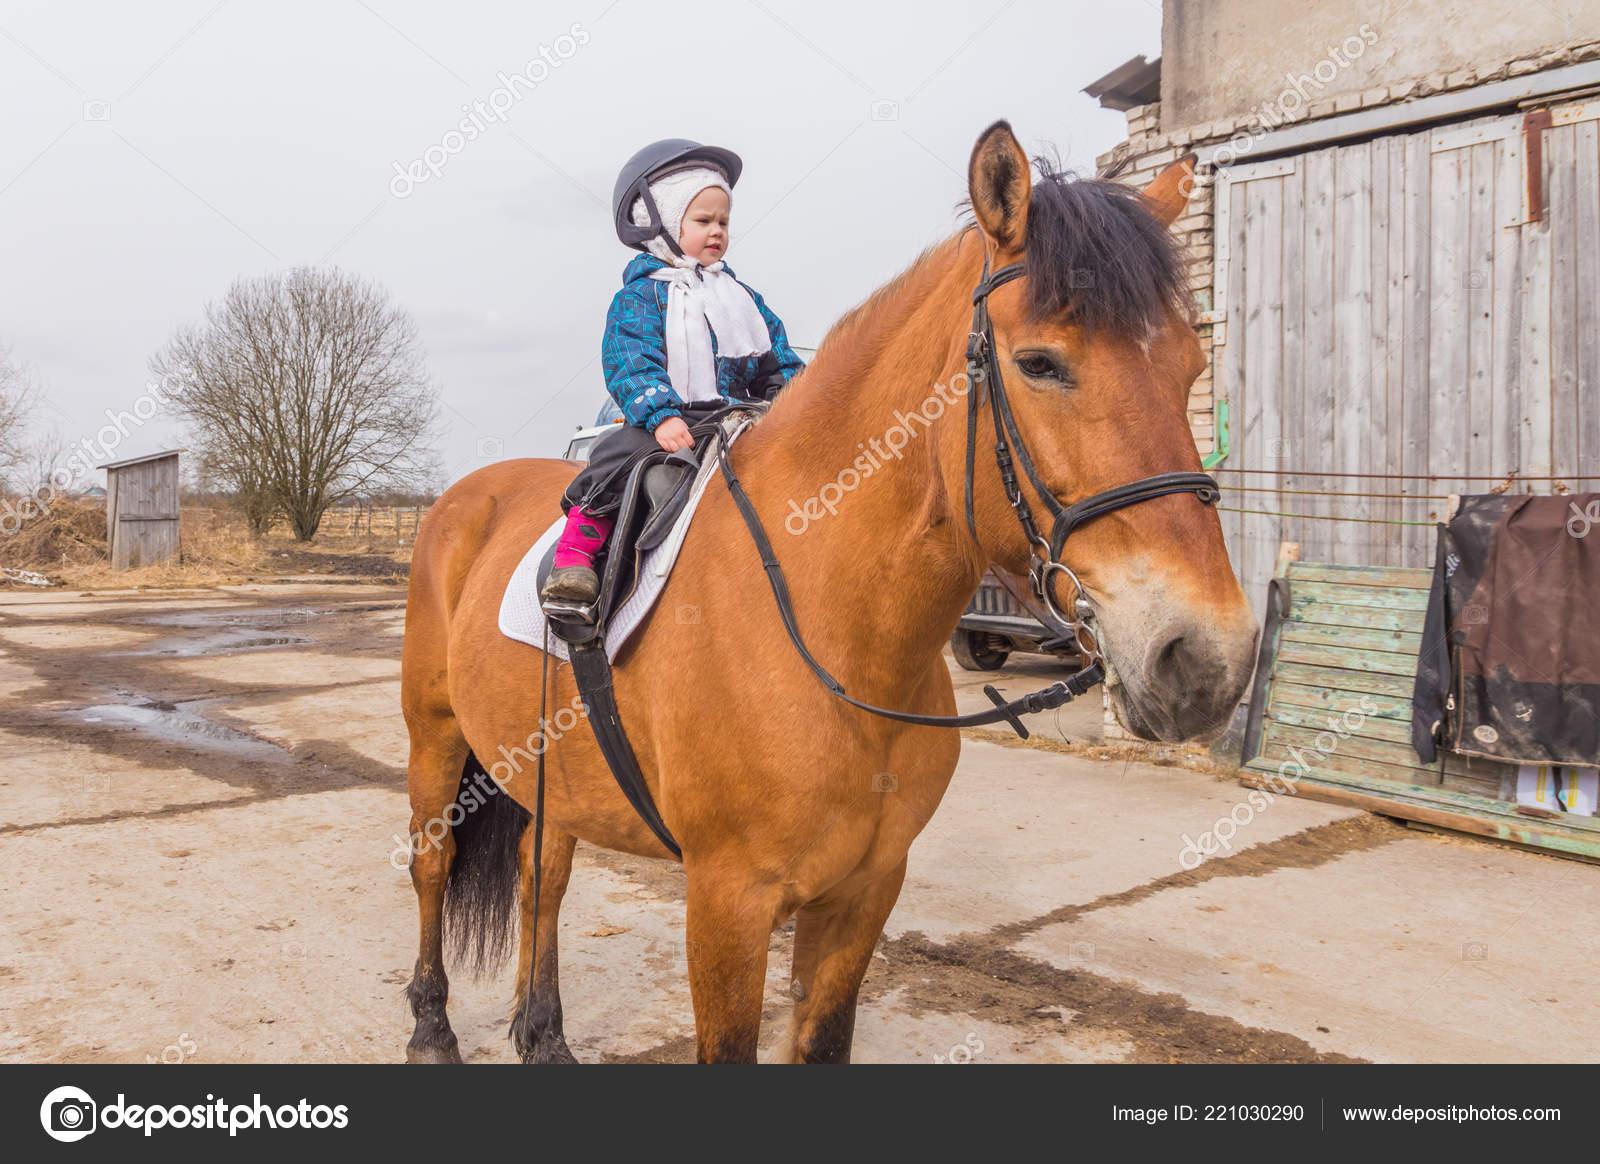 Russia Leningrad Region Nikolskoye March 2017 Stable Horse Riding Girls Stock Editorial Photo C P Kdmitry 221030290